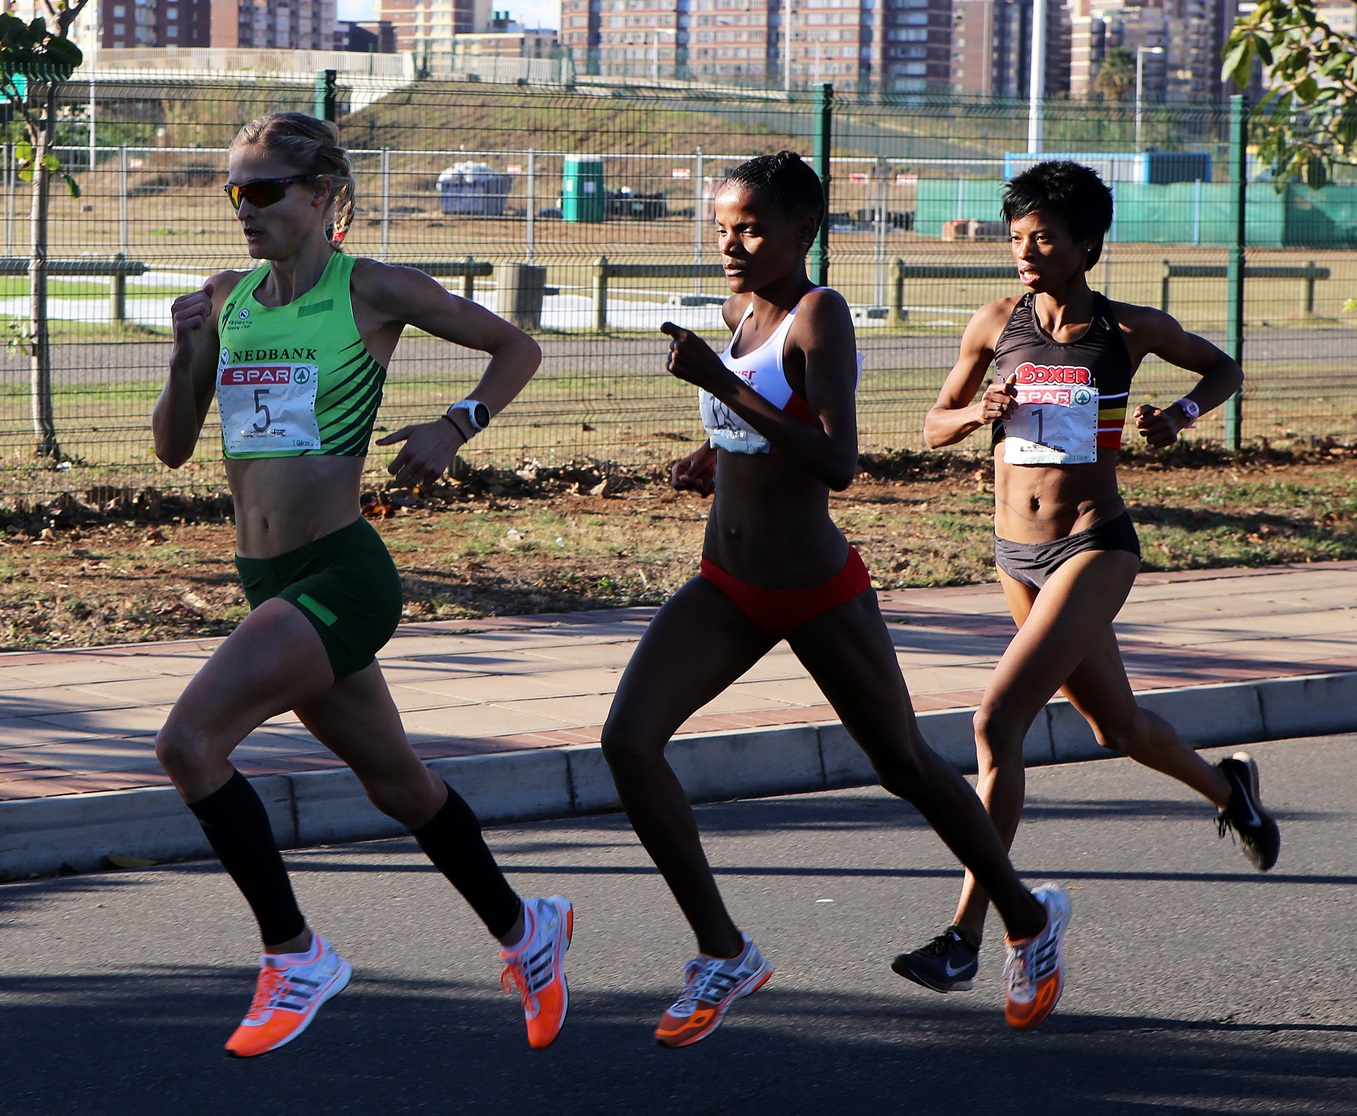 Fastest women set sights on final 10km Challenge